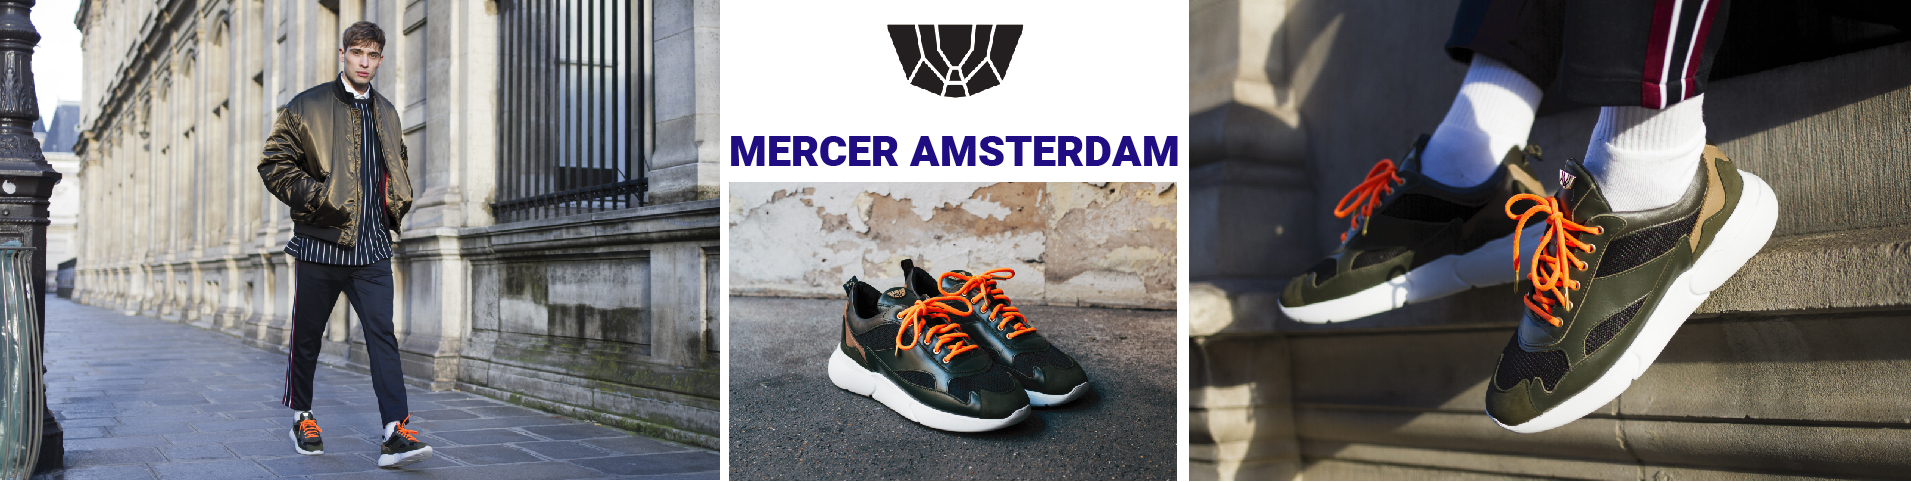 Mercer Amsterdam Sneaker für Herren online shoppen | Low